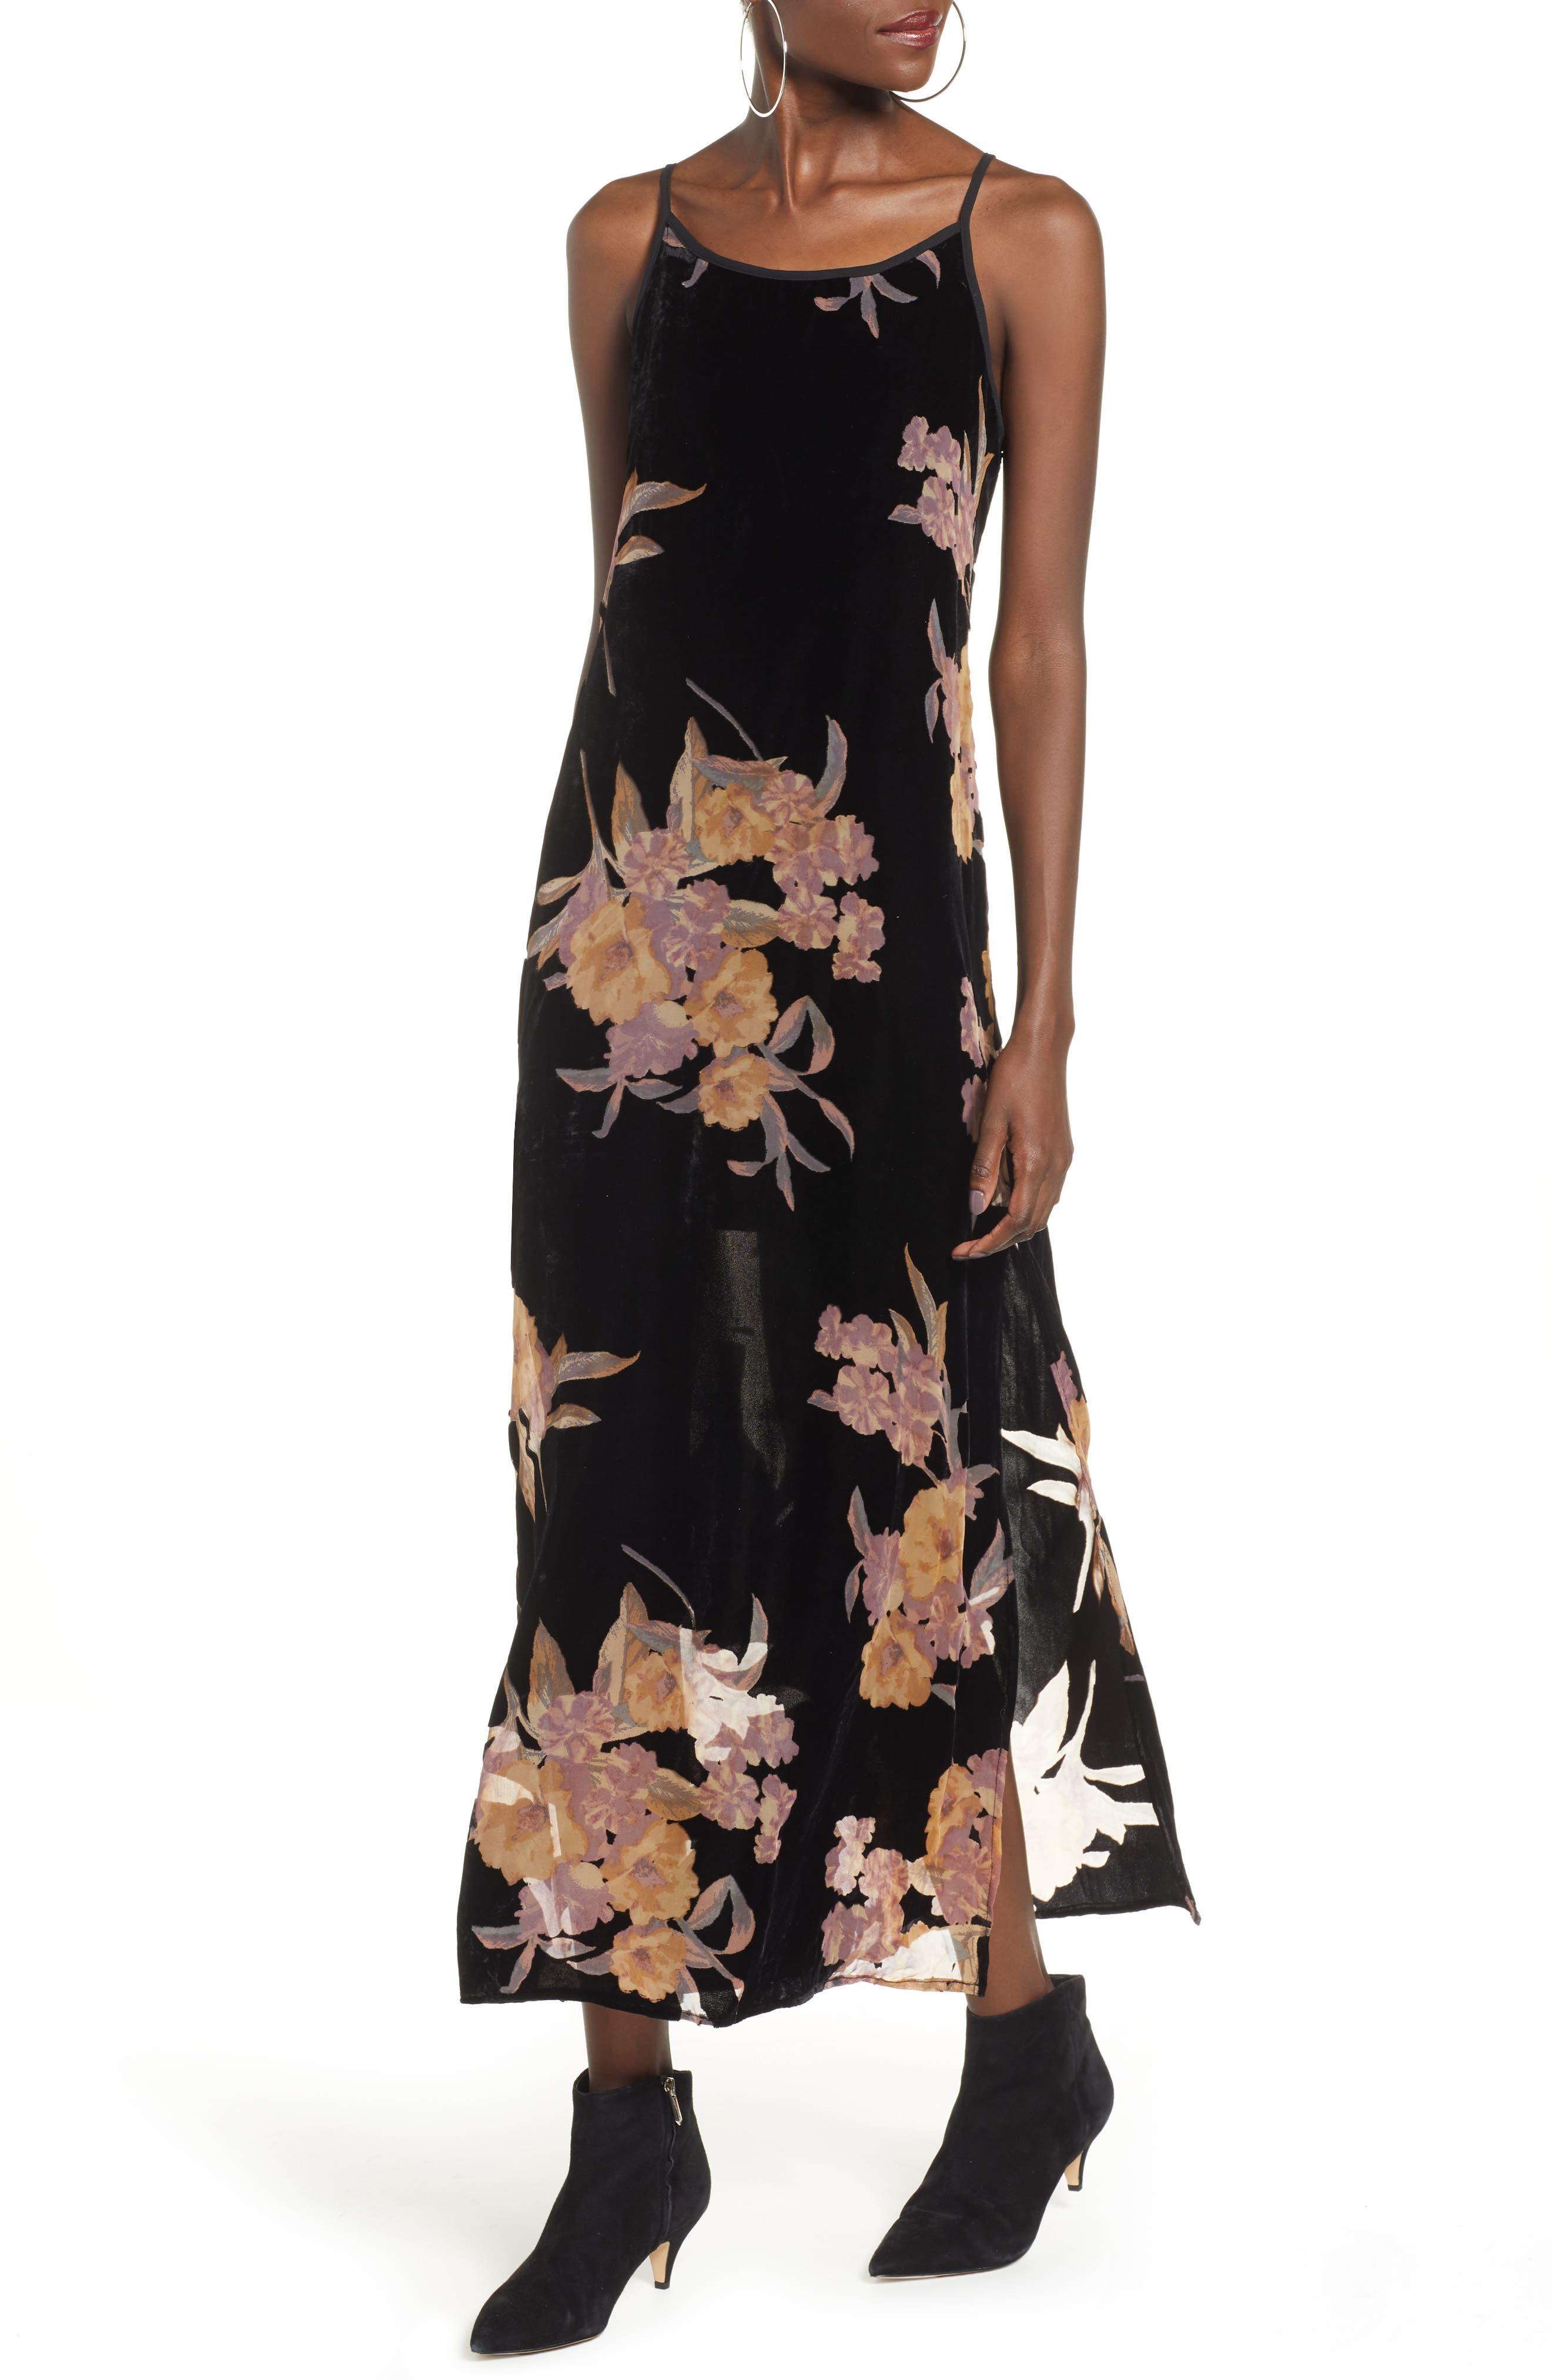 BAND OF GYPSIES,                             Mallorey Floral Print Velvet Dress,                             Main thumbnail 1, color,                             001